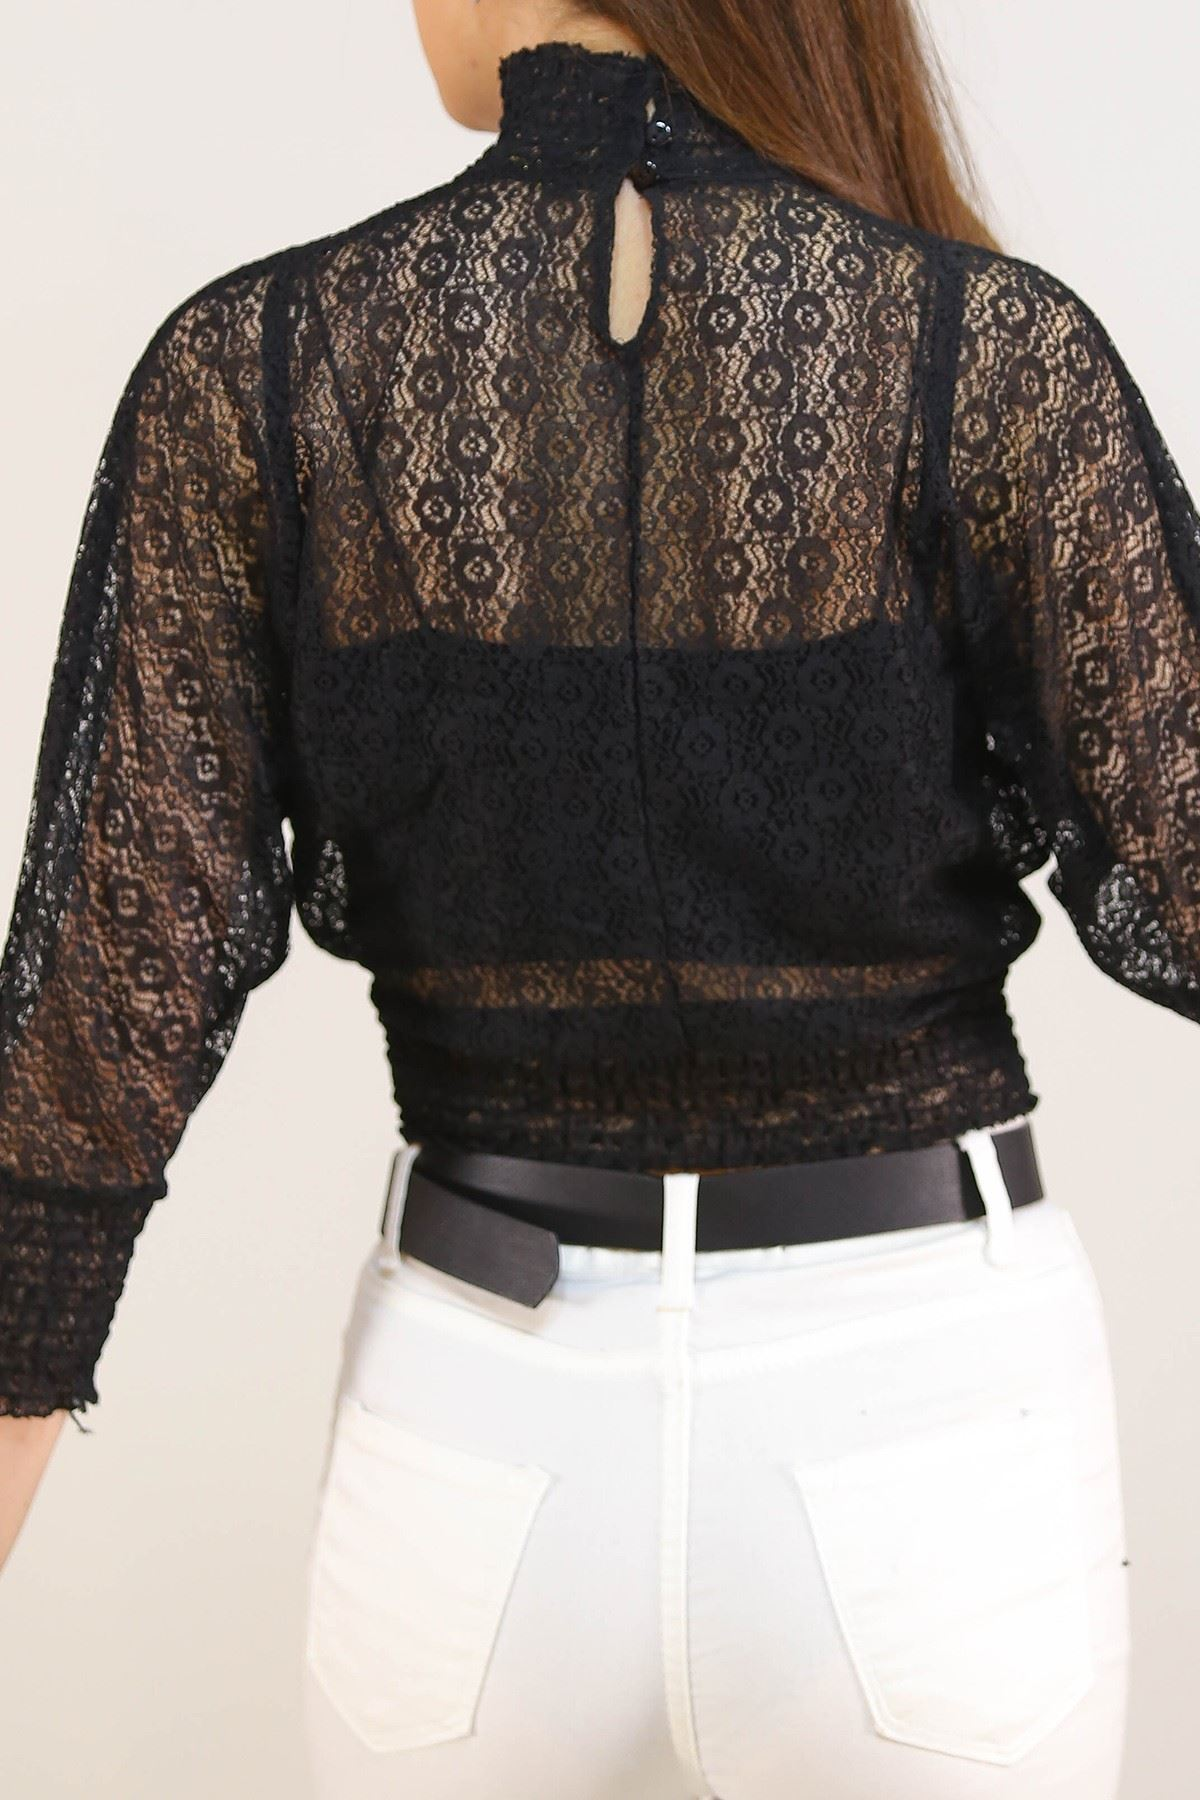 Dantelli Bluz Siyah - 5209.224.